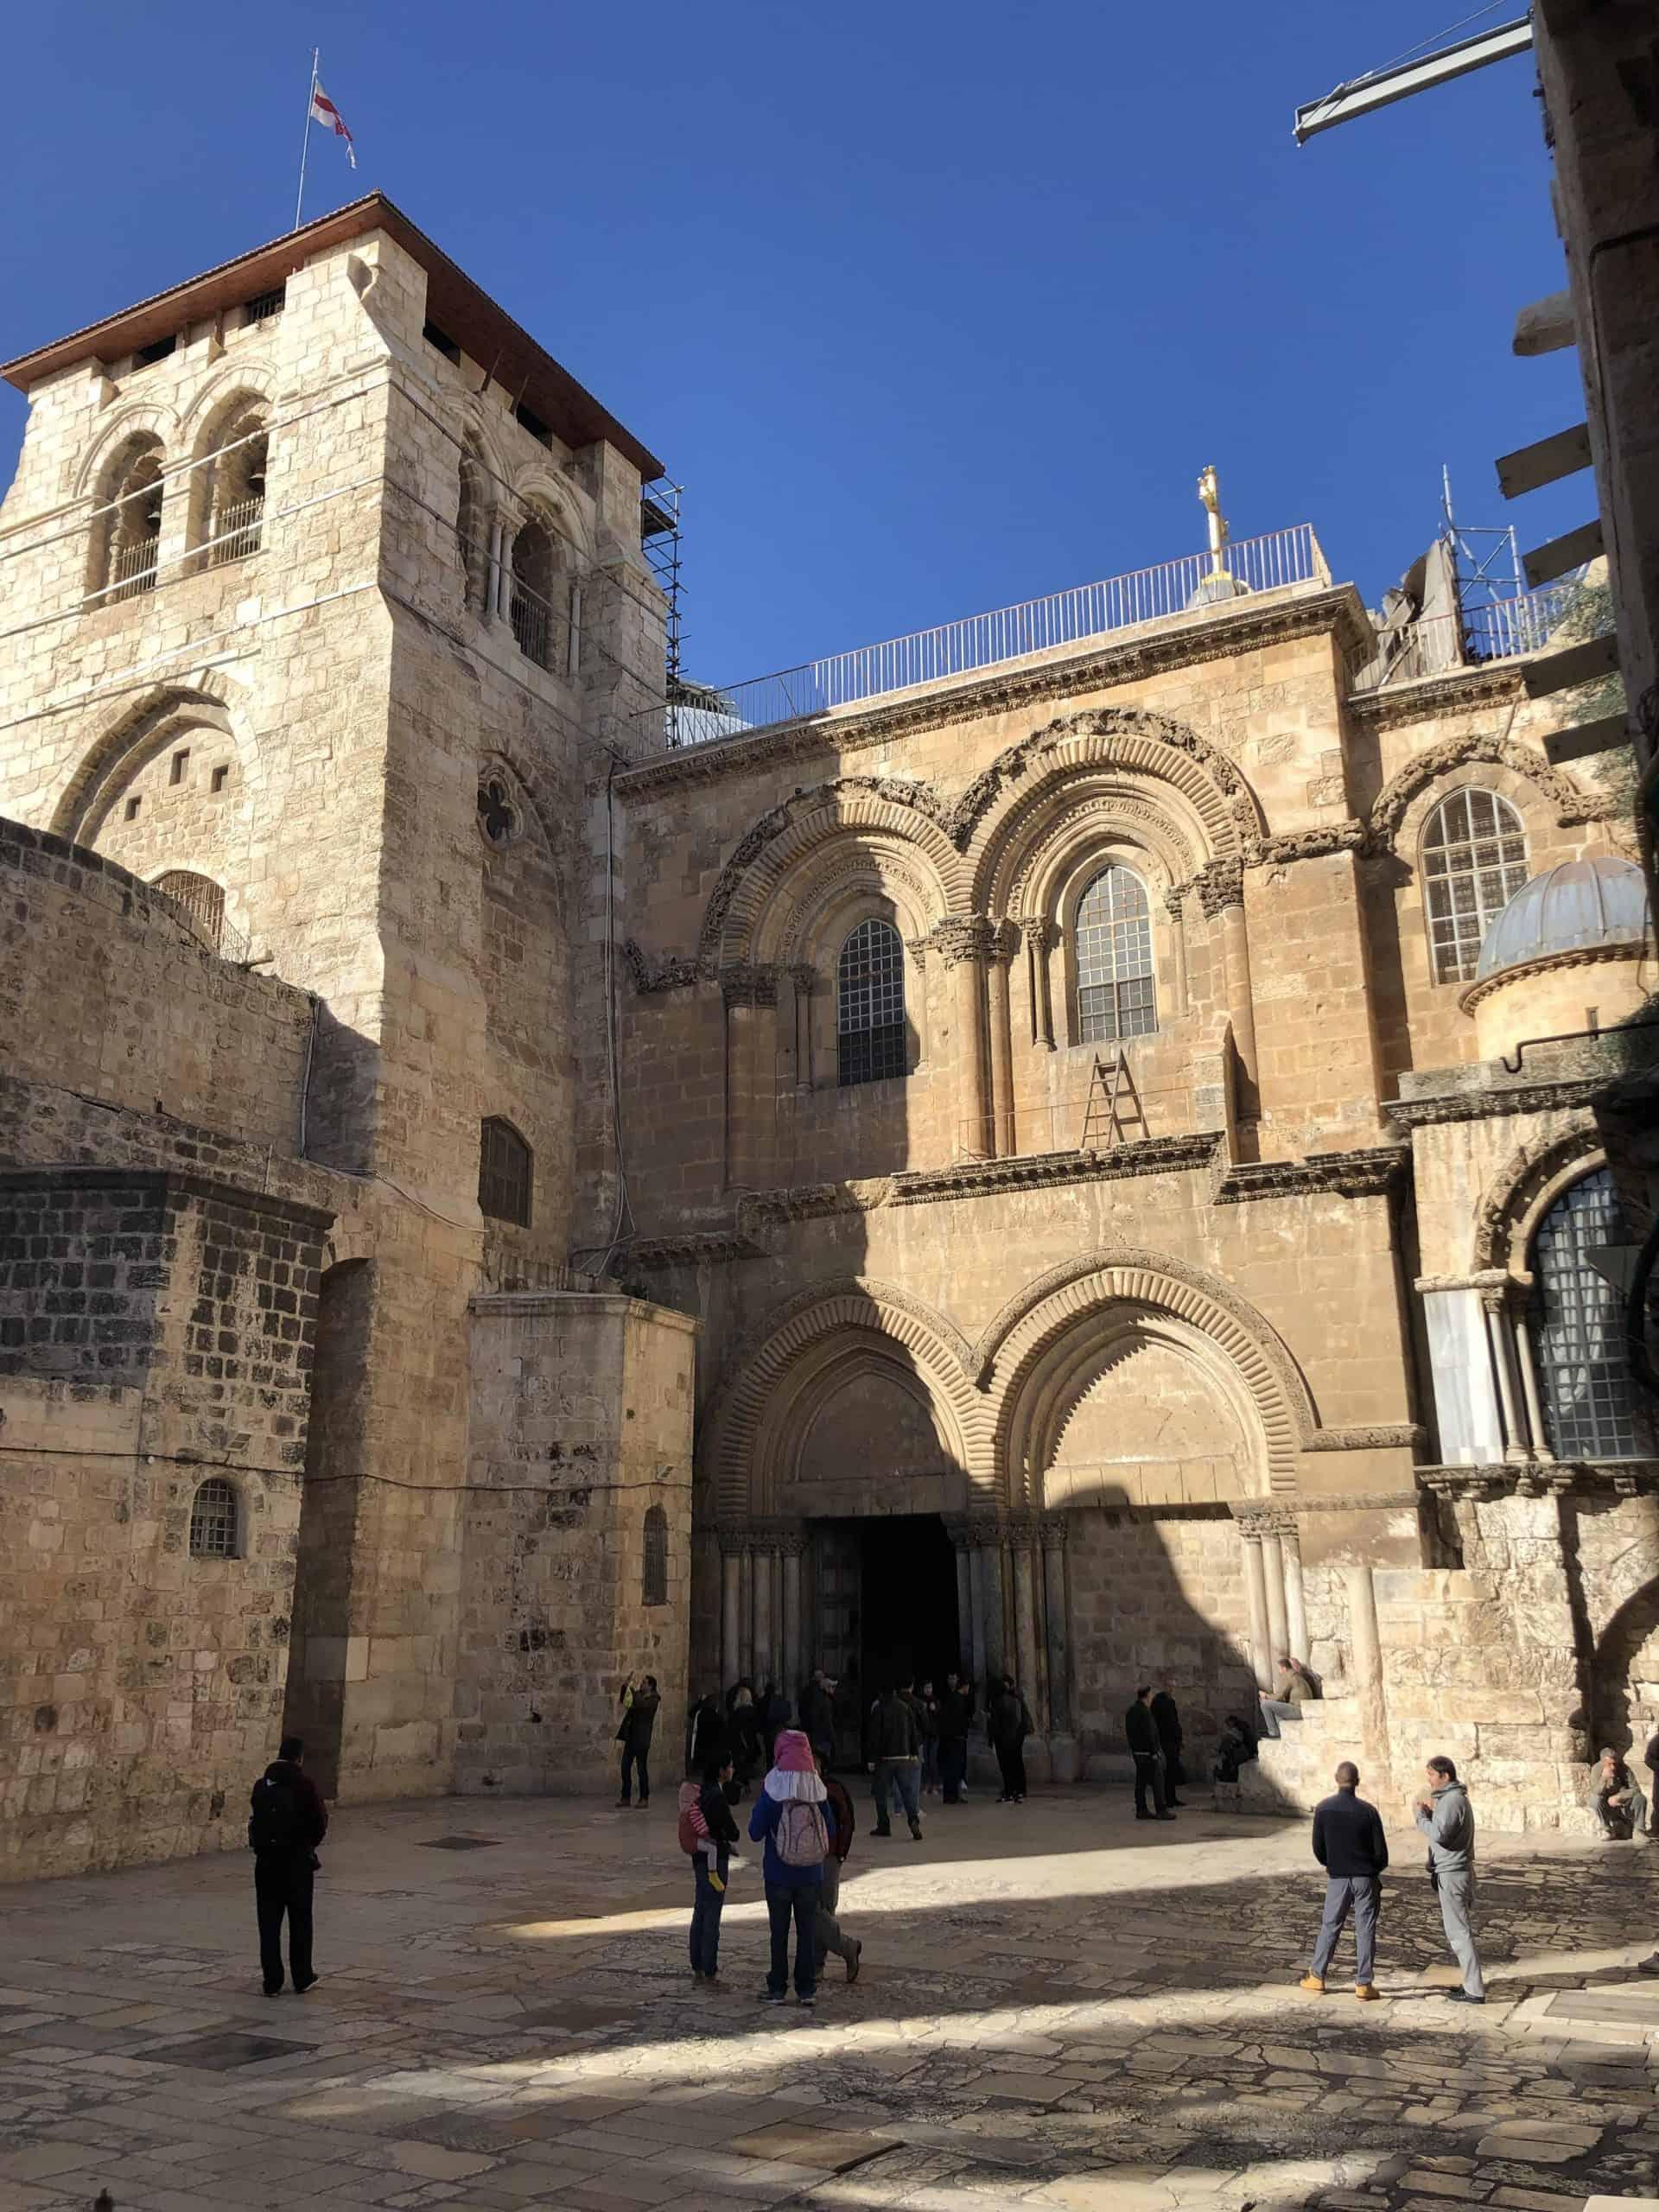 essentialjerusalem_tp6.0_Church_of_the_Holy_Sepulchre,_Jerusalem_2018_01